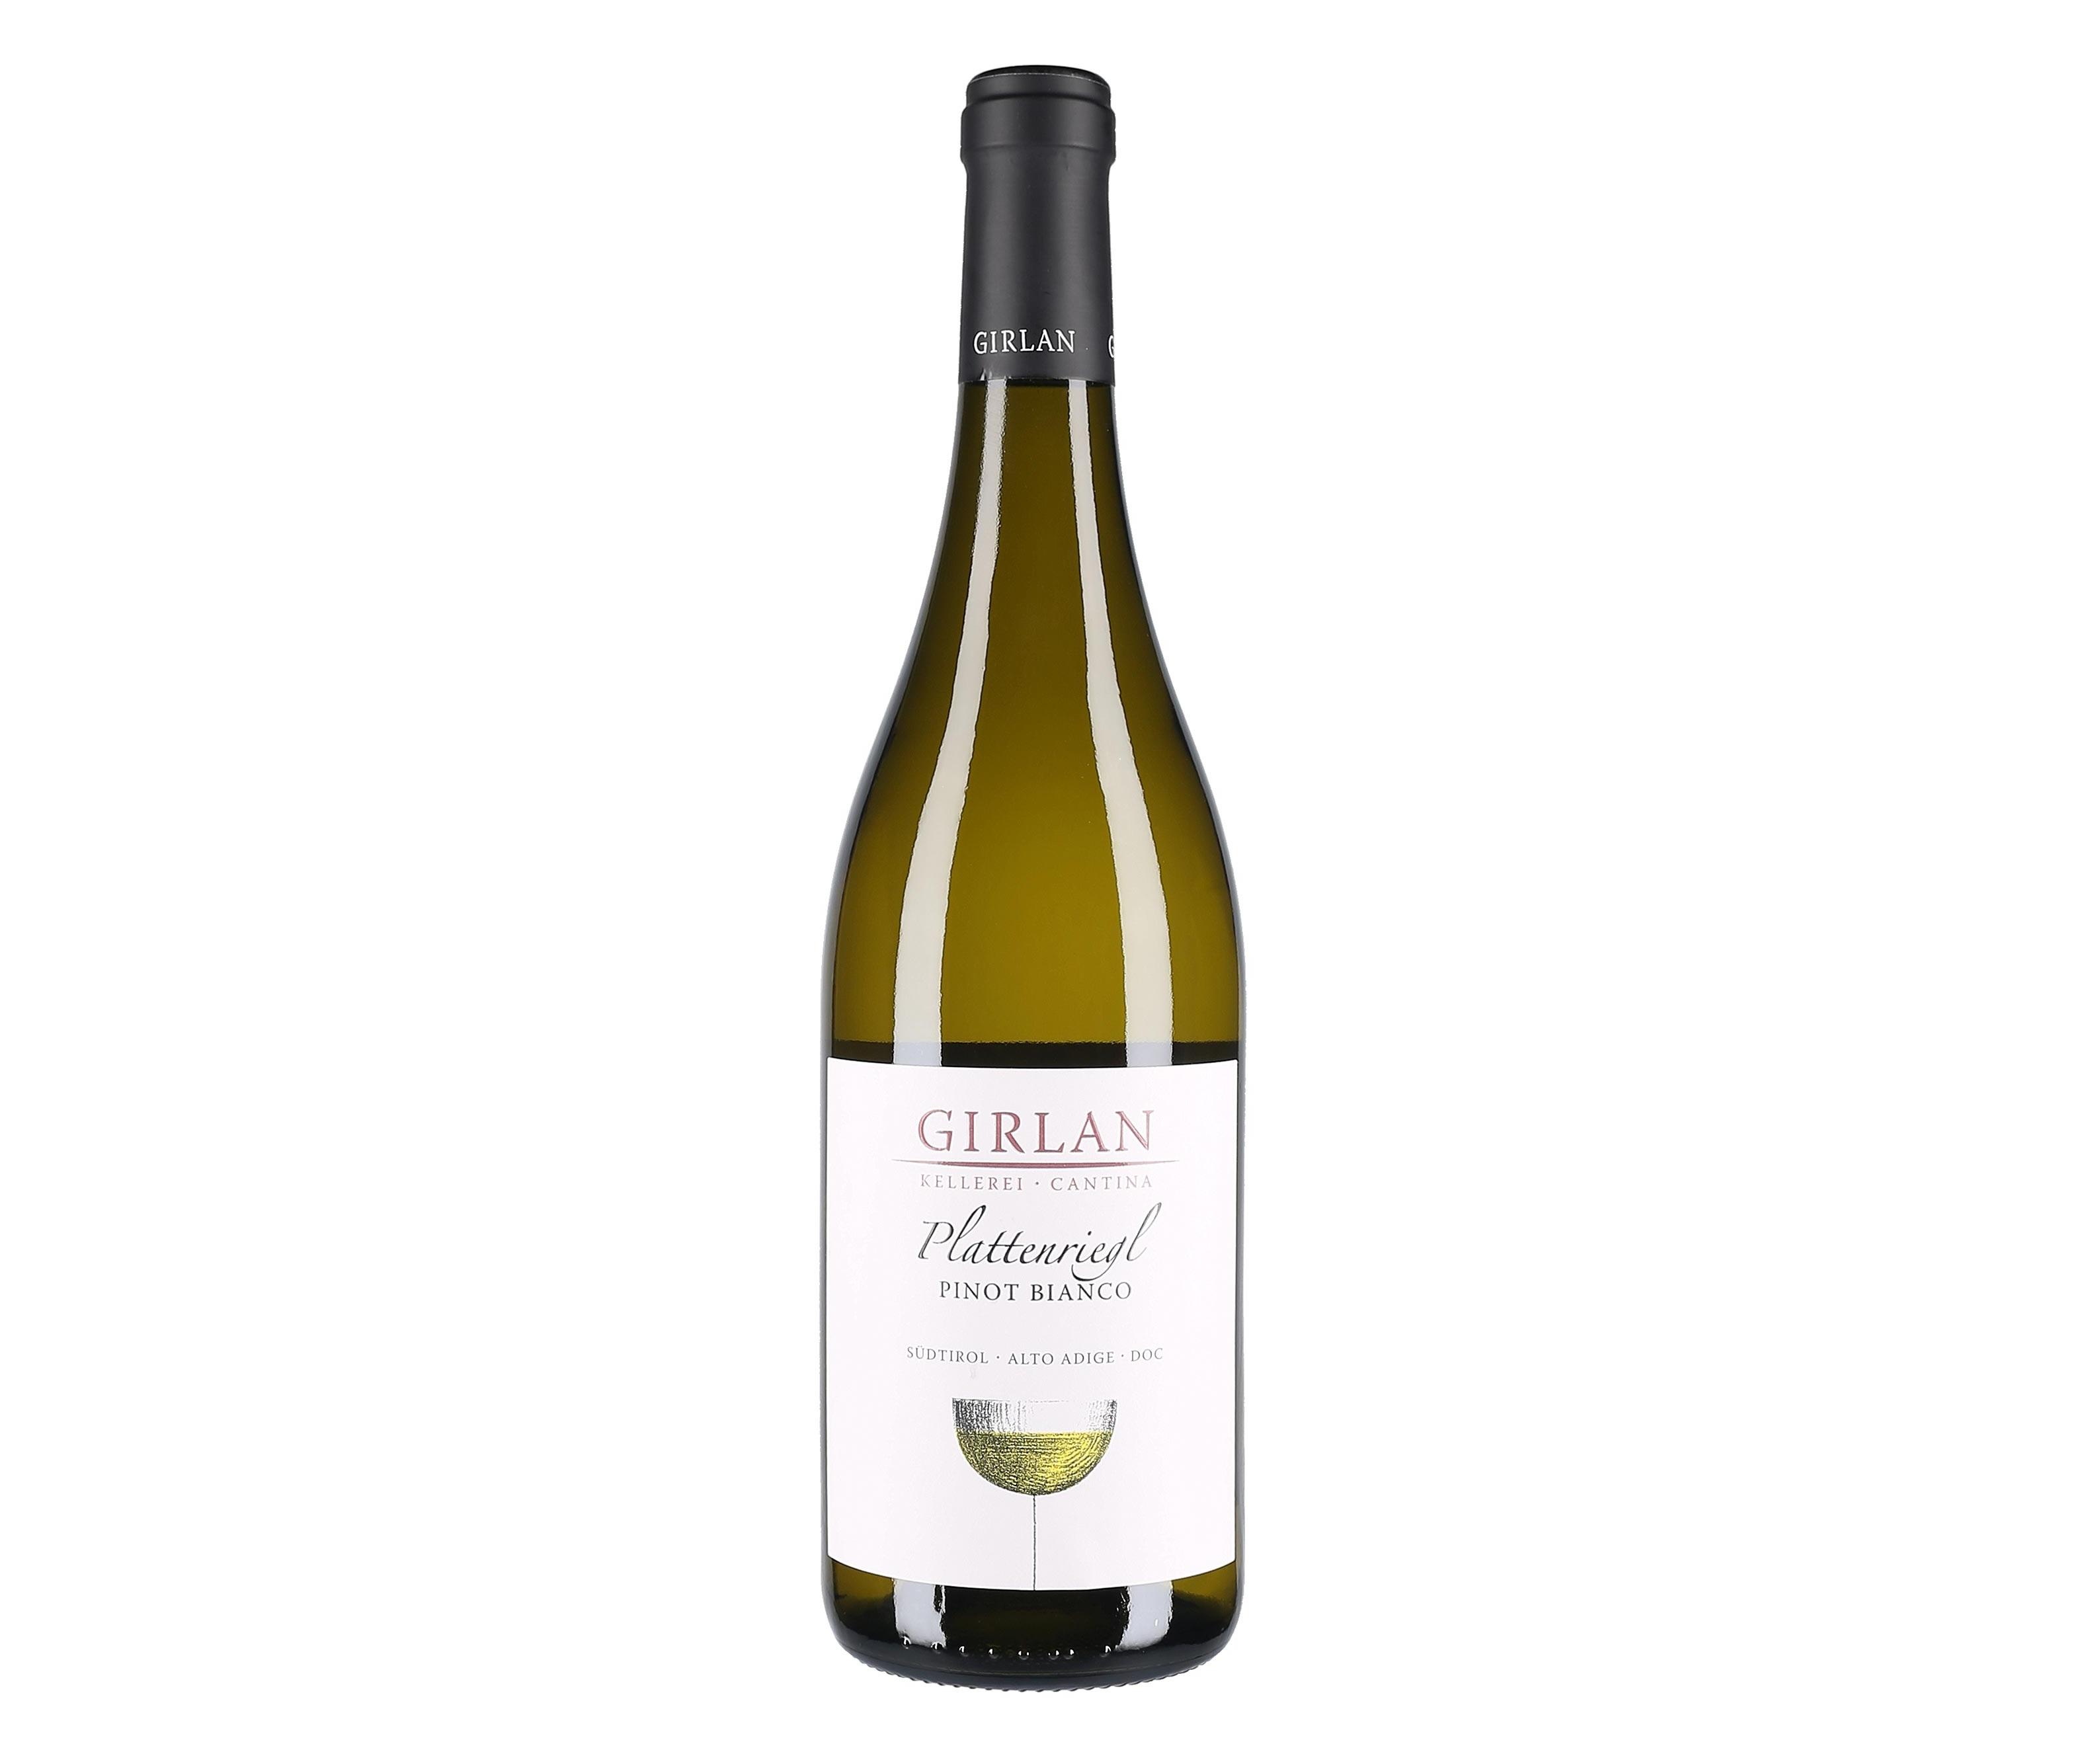 Alto Adige Pinot Bianco Plattenriegl 2015 Girlan